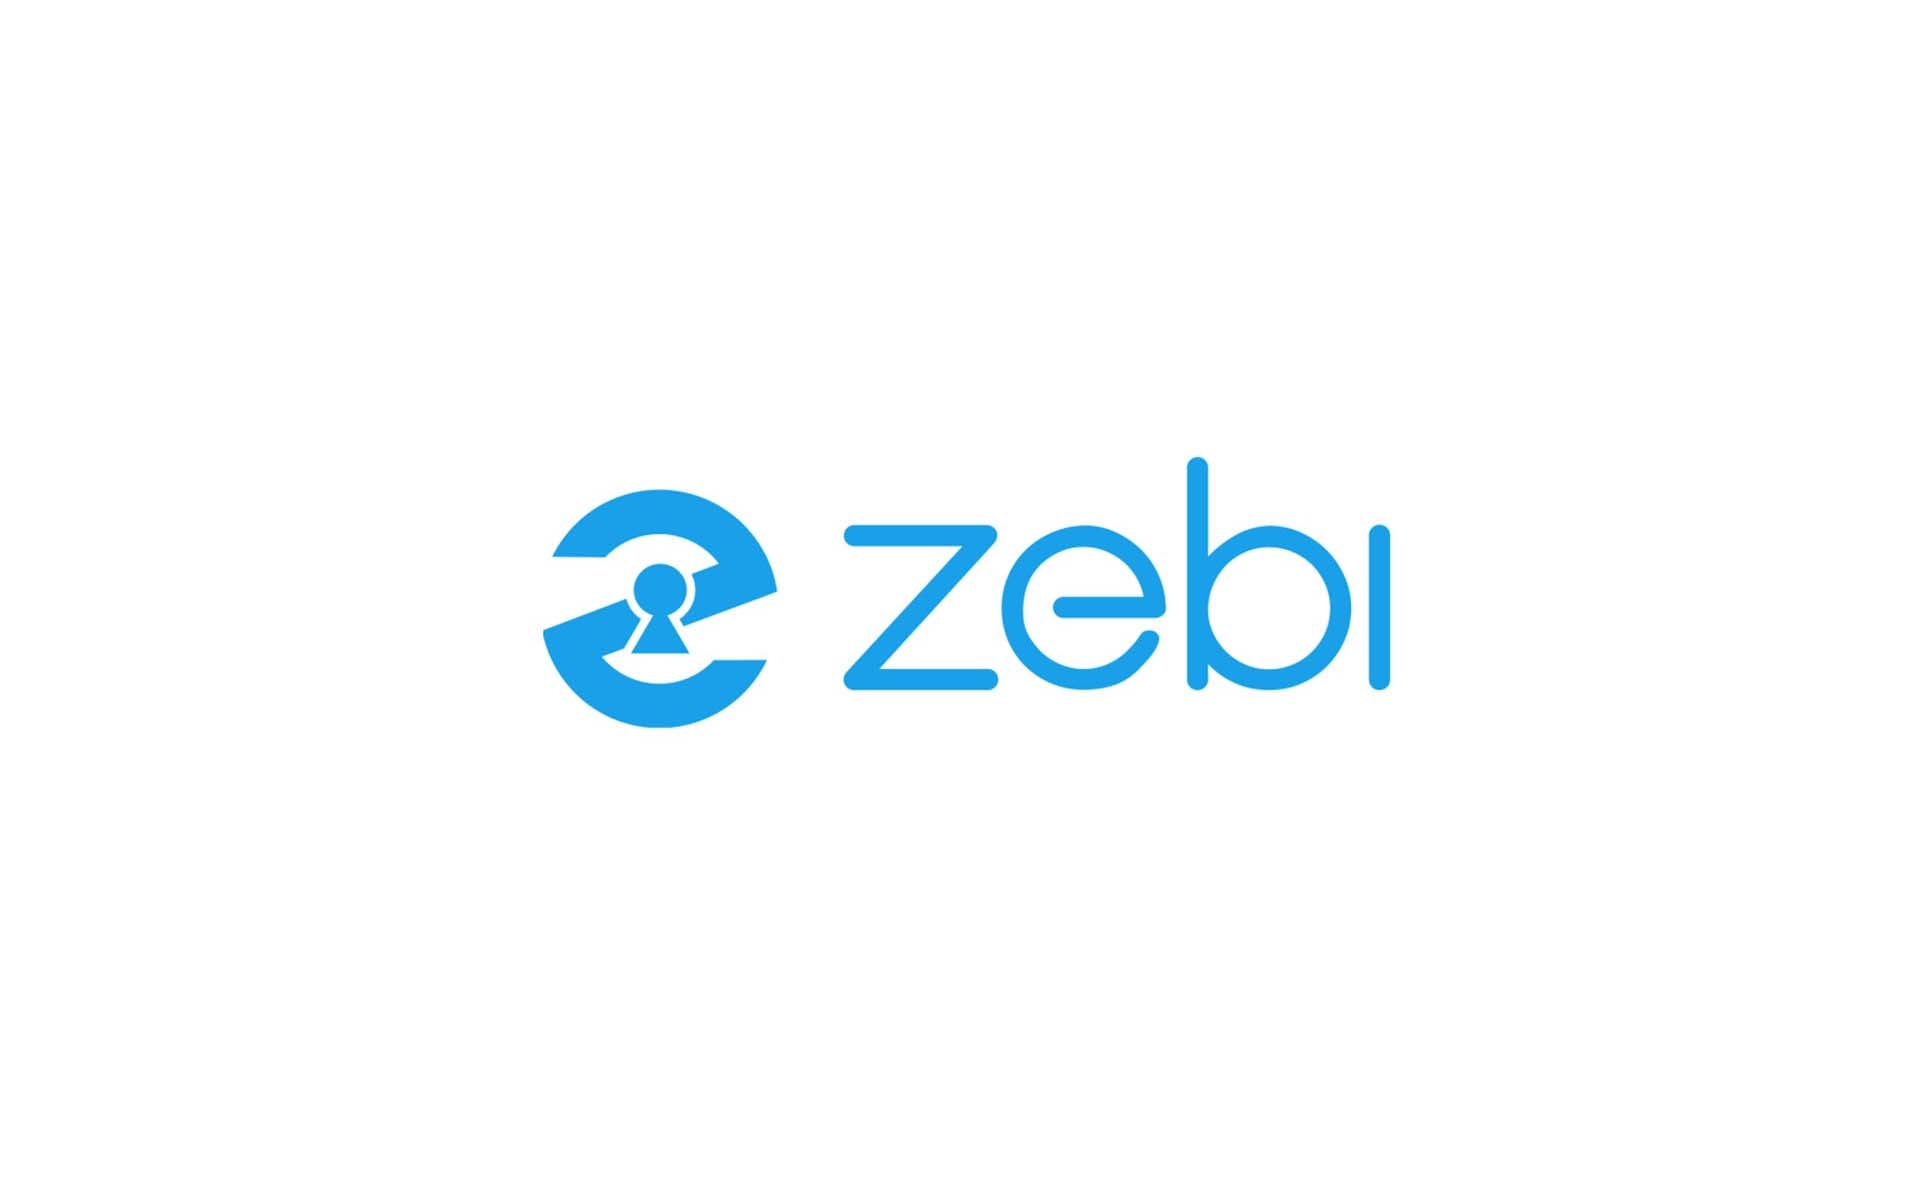 Zebi Announces $100,000 Airdrop Lottery